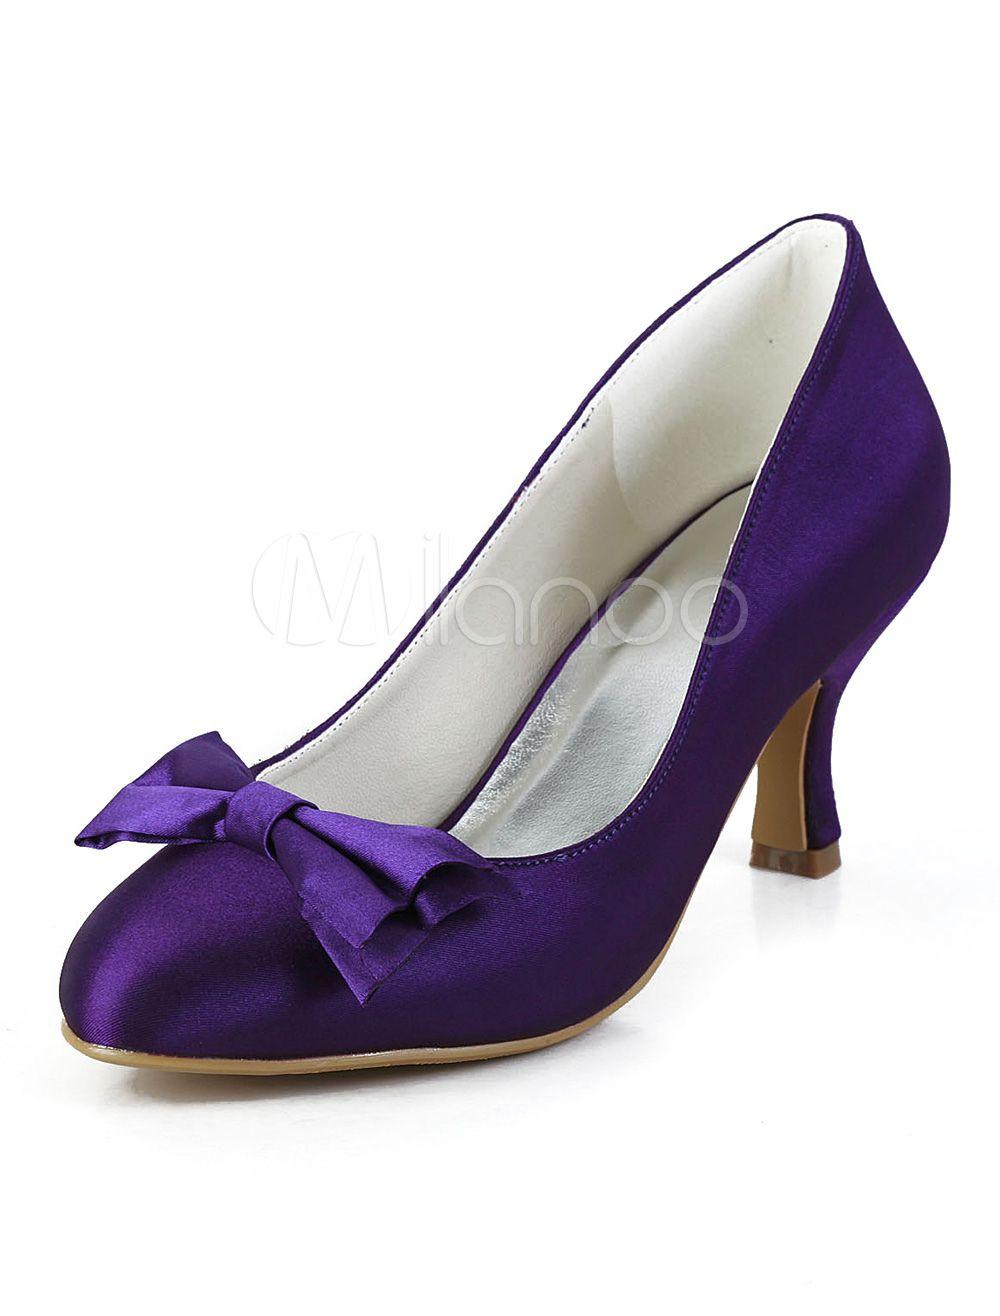 Pretty Purple Silk And Satin Bow Round Toe Shoes For Bride Bride